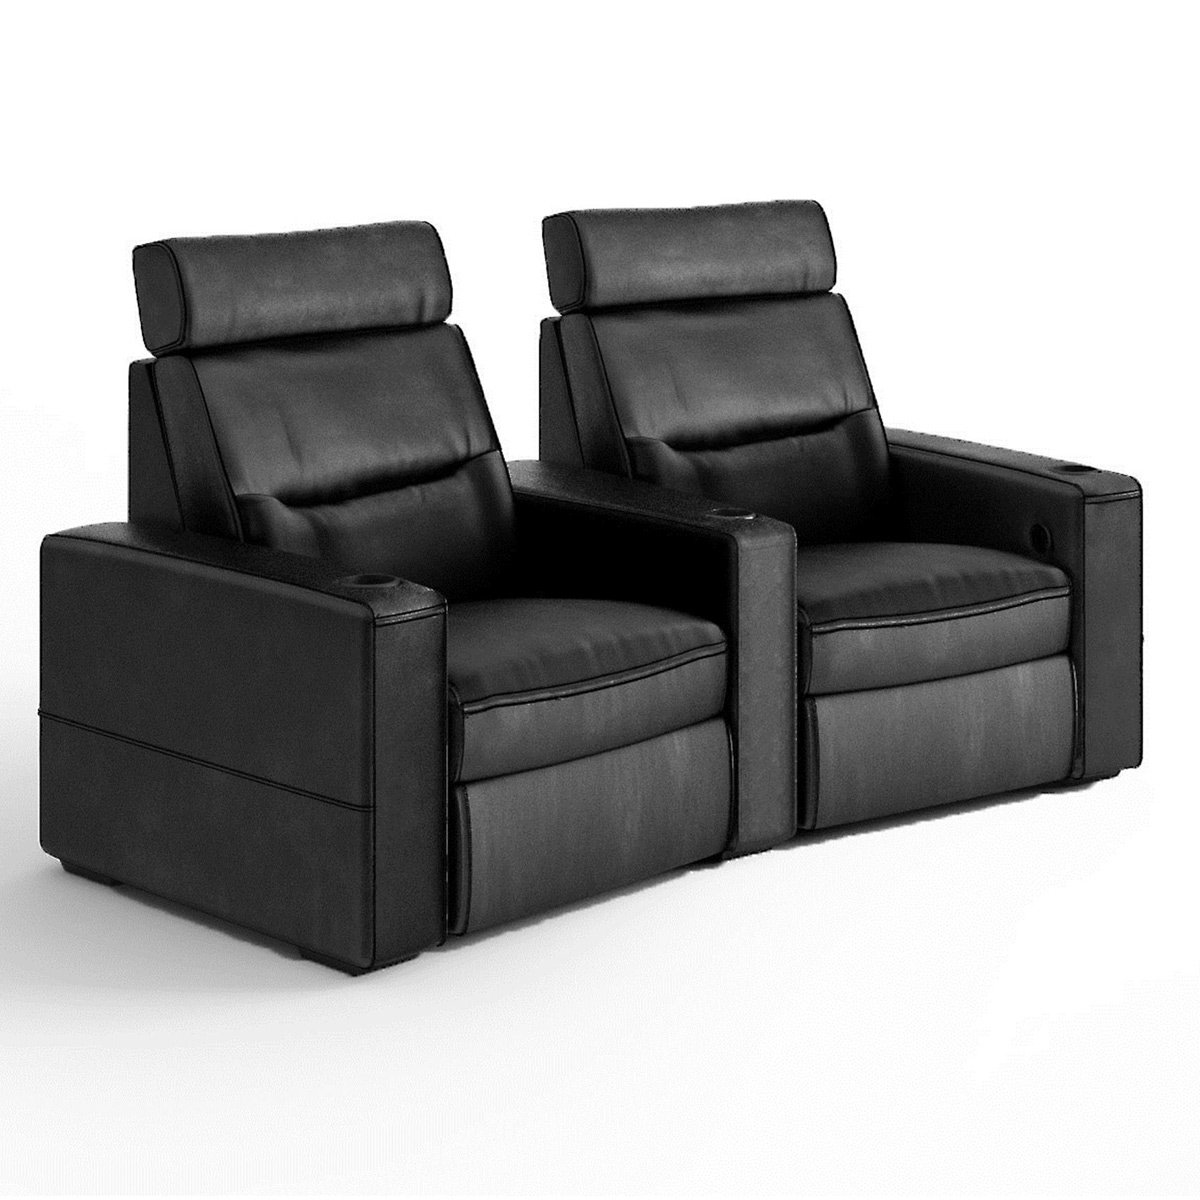 Salamander TC3 AV Basics 2-Seat Wedge Motorized Recliner Home Theater Seating (Black Bonded Leather)